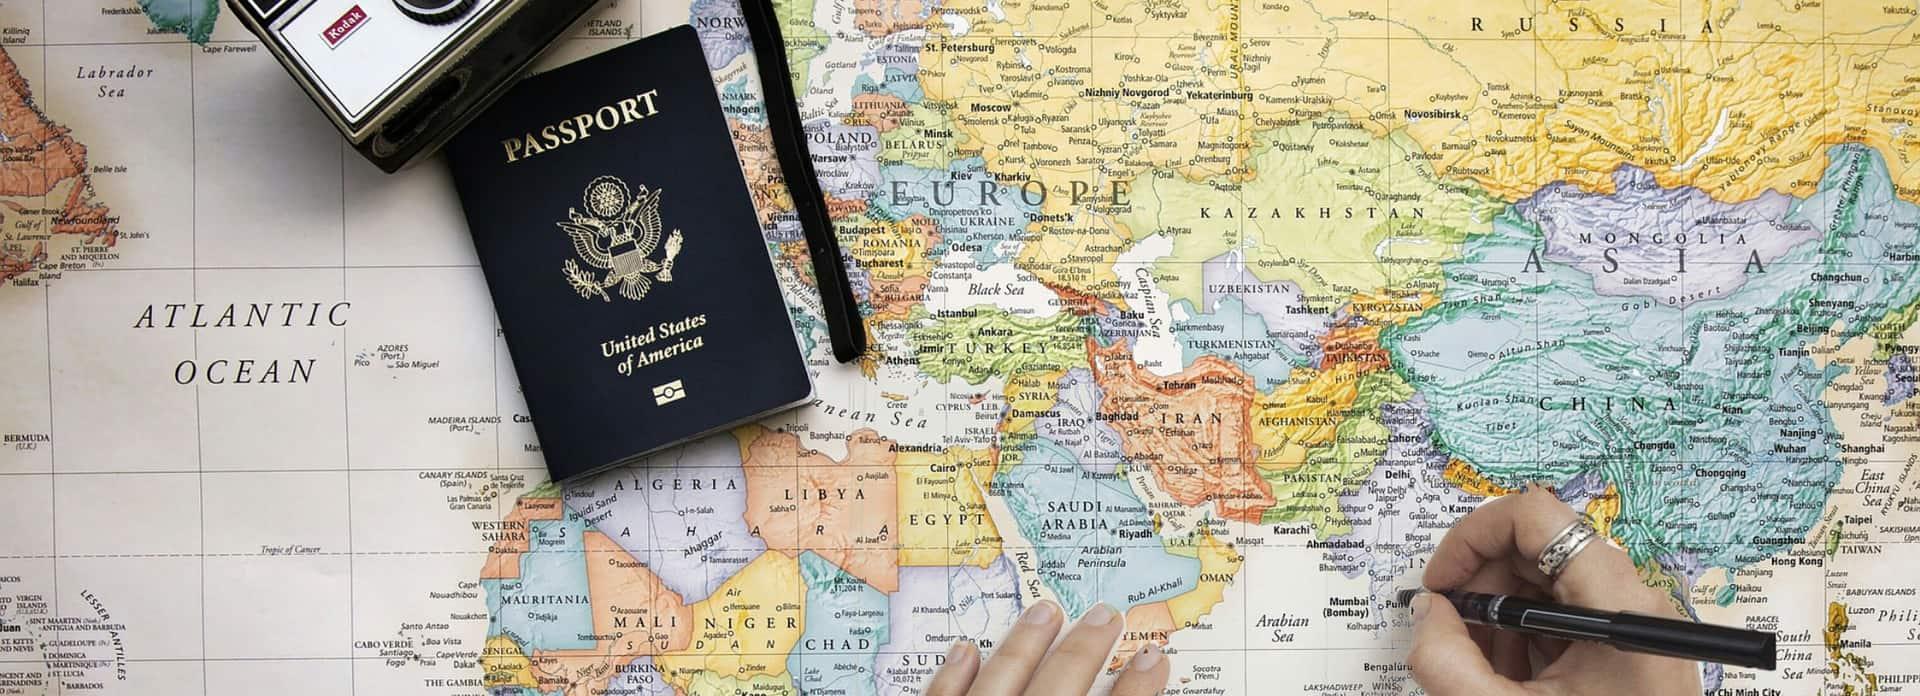 conseils budget voyage